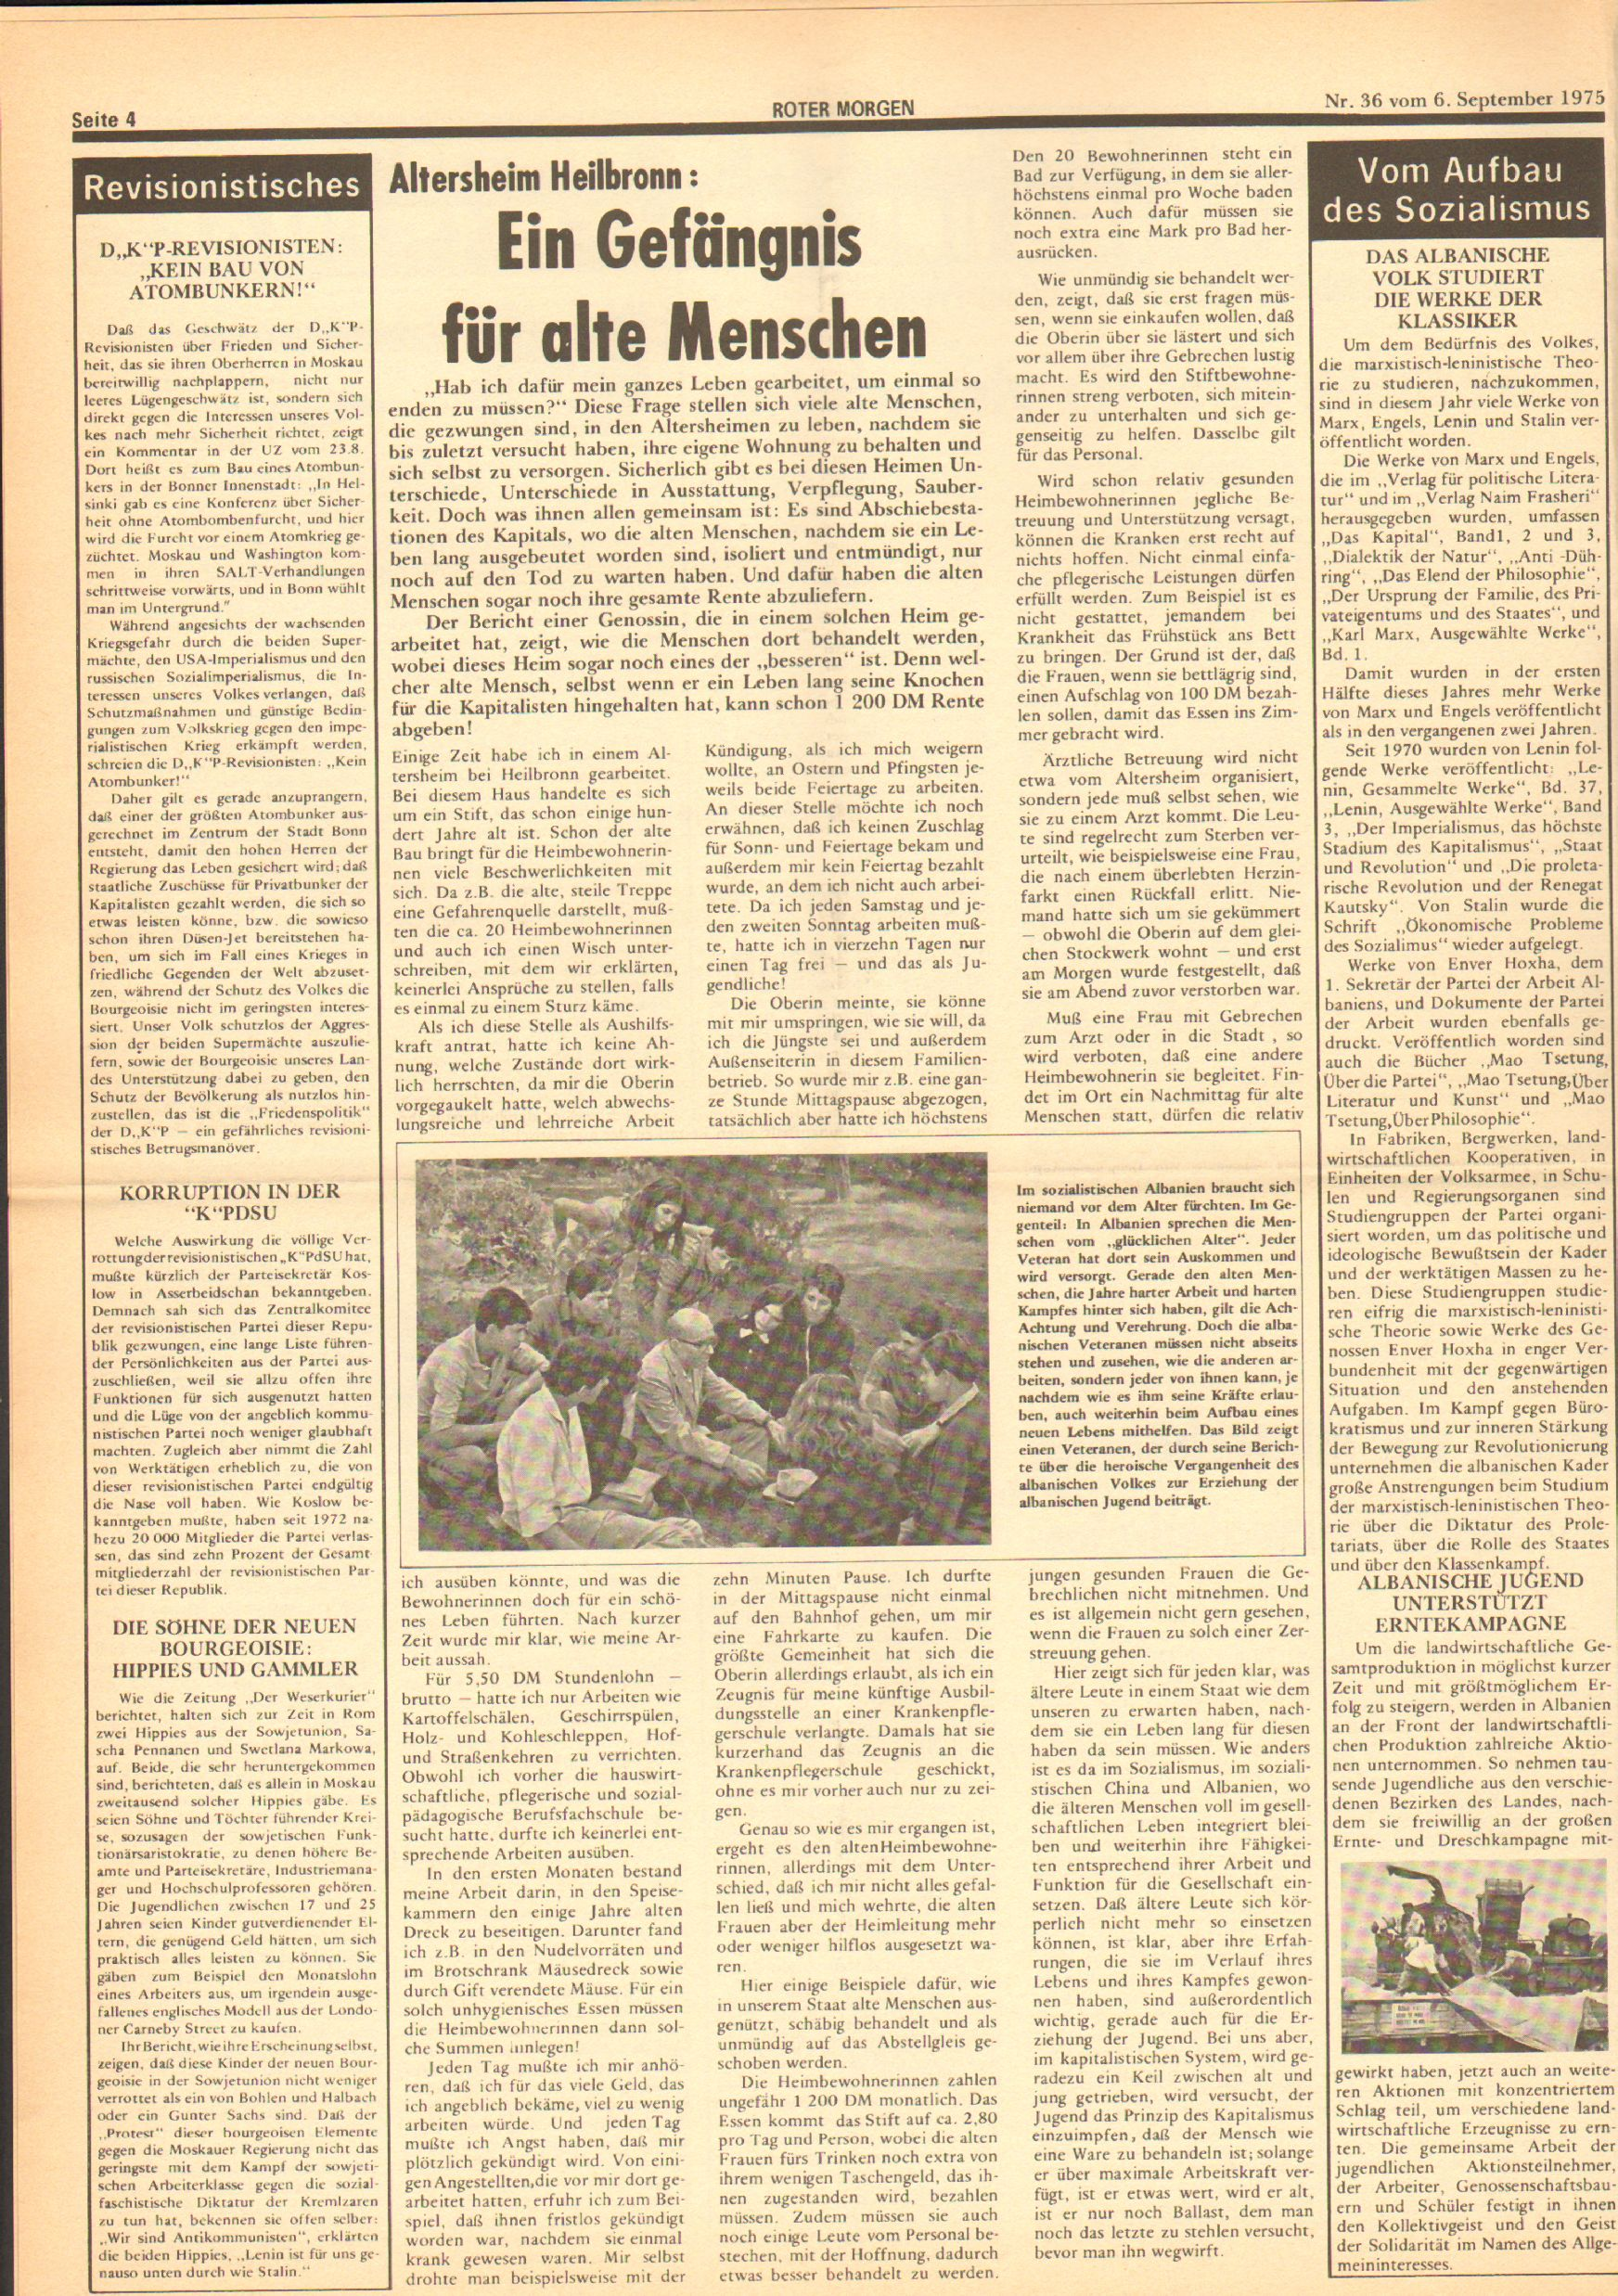 Roter Morgen, 9. Jg., 6. September 1975, Nr. 36, Seite 4